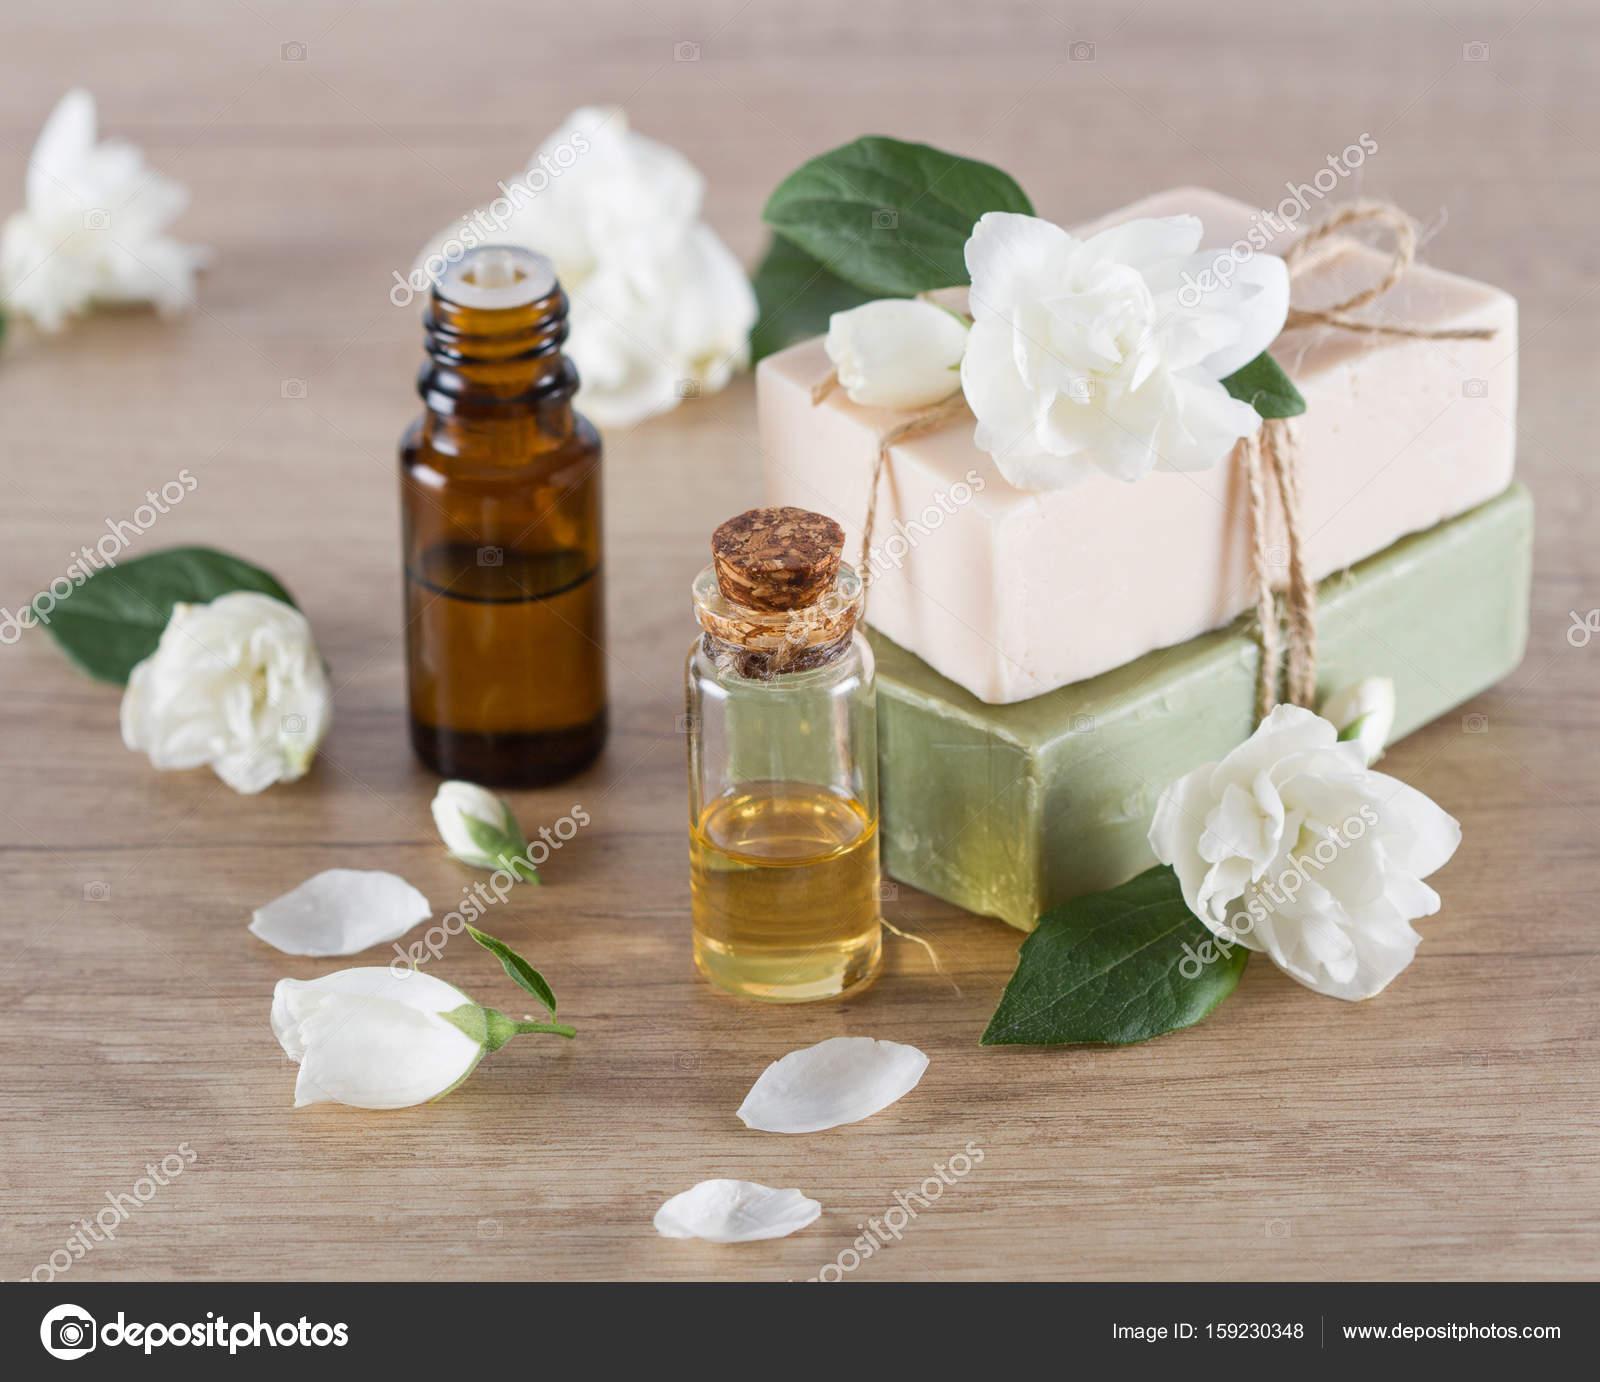 Jasmine Essential Oil And Jasmine Blossom Hanmade Soap Stock